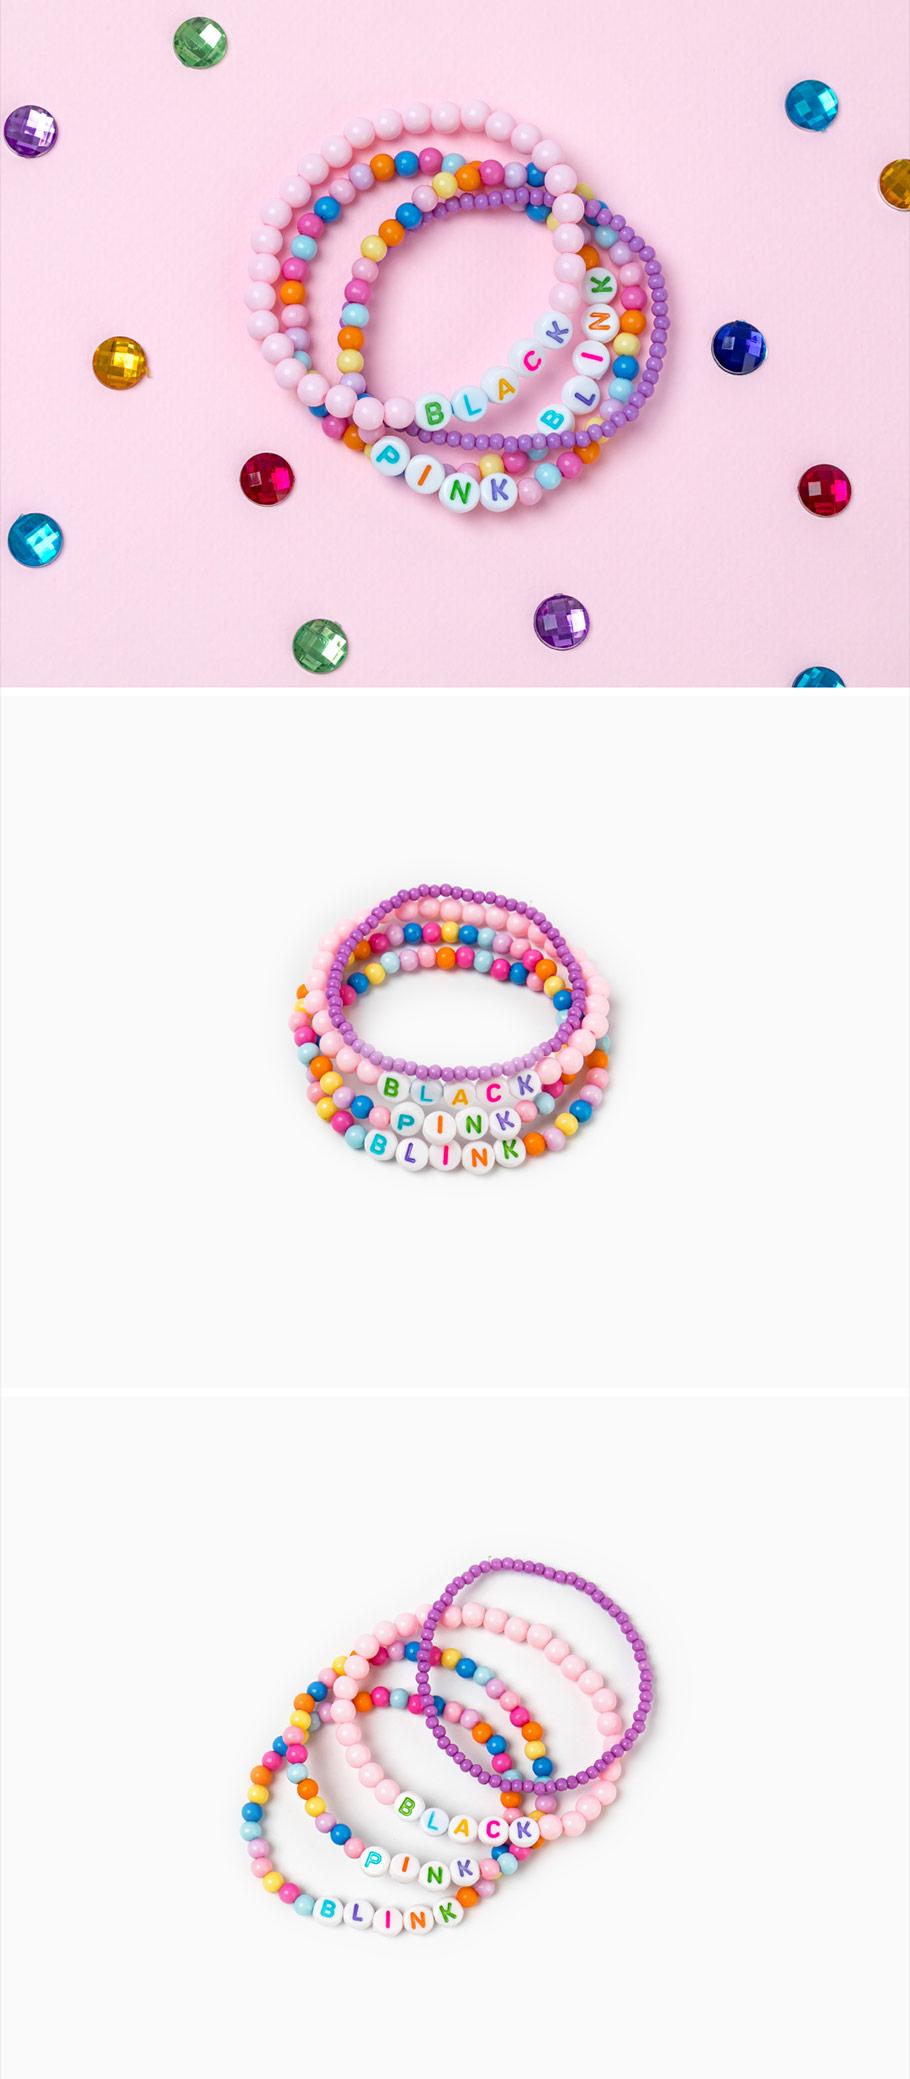 blackpink_lattop_bracelet-1